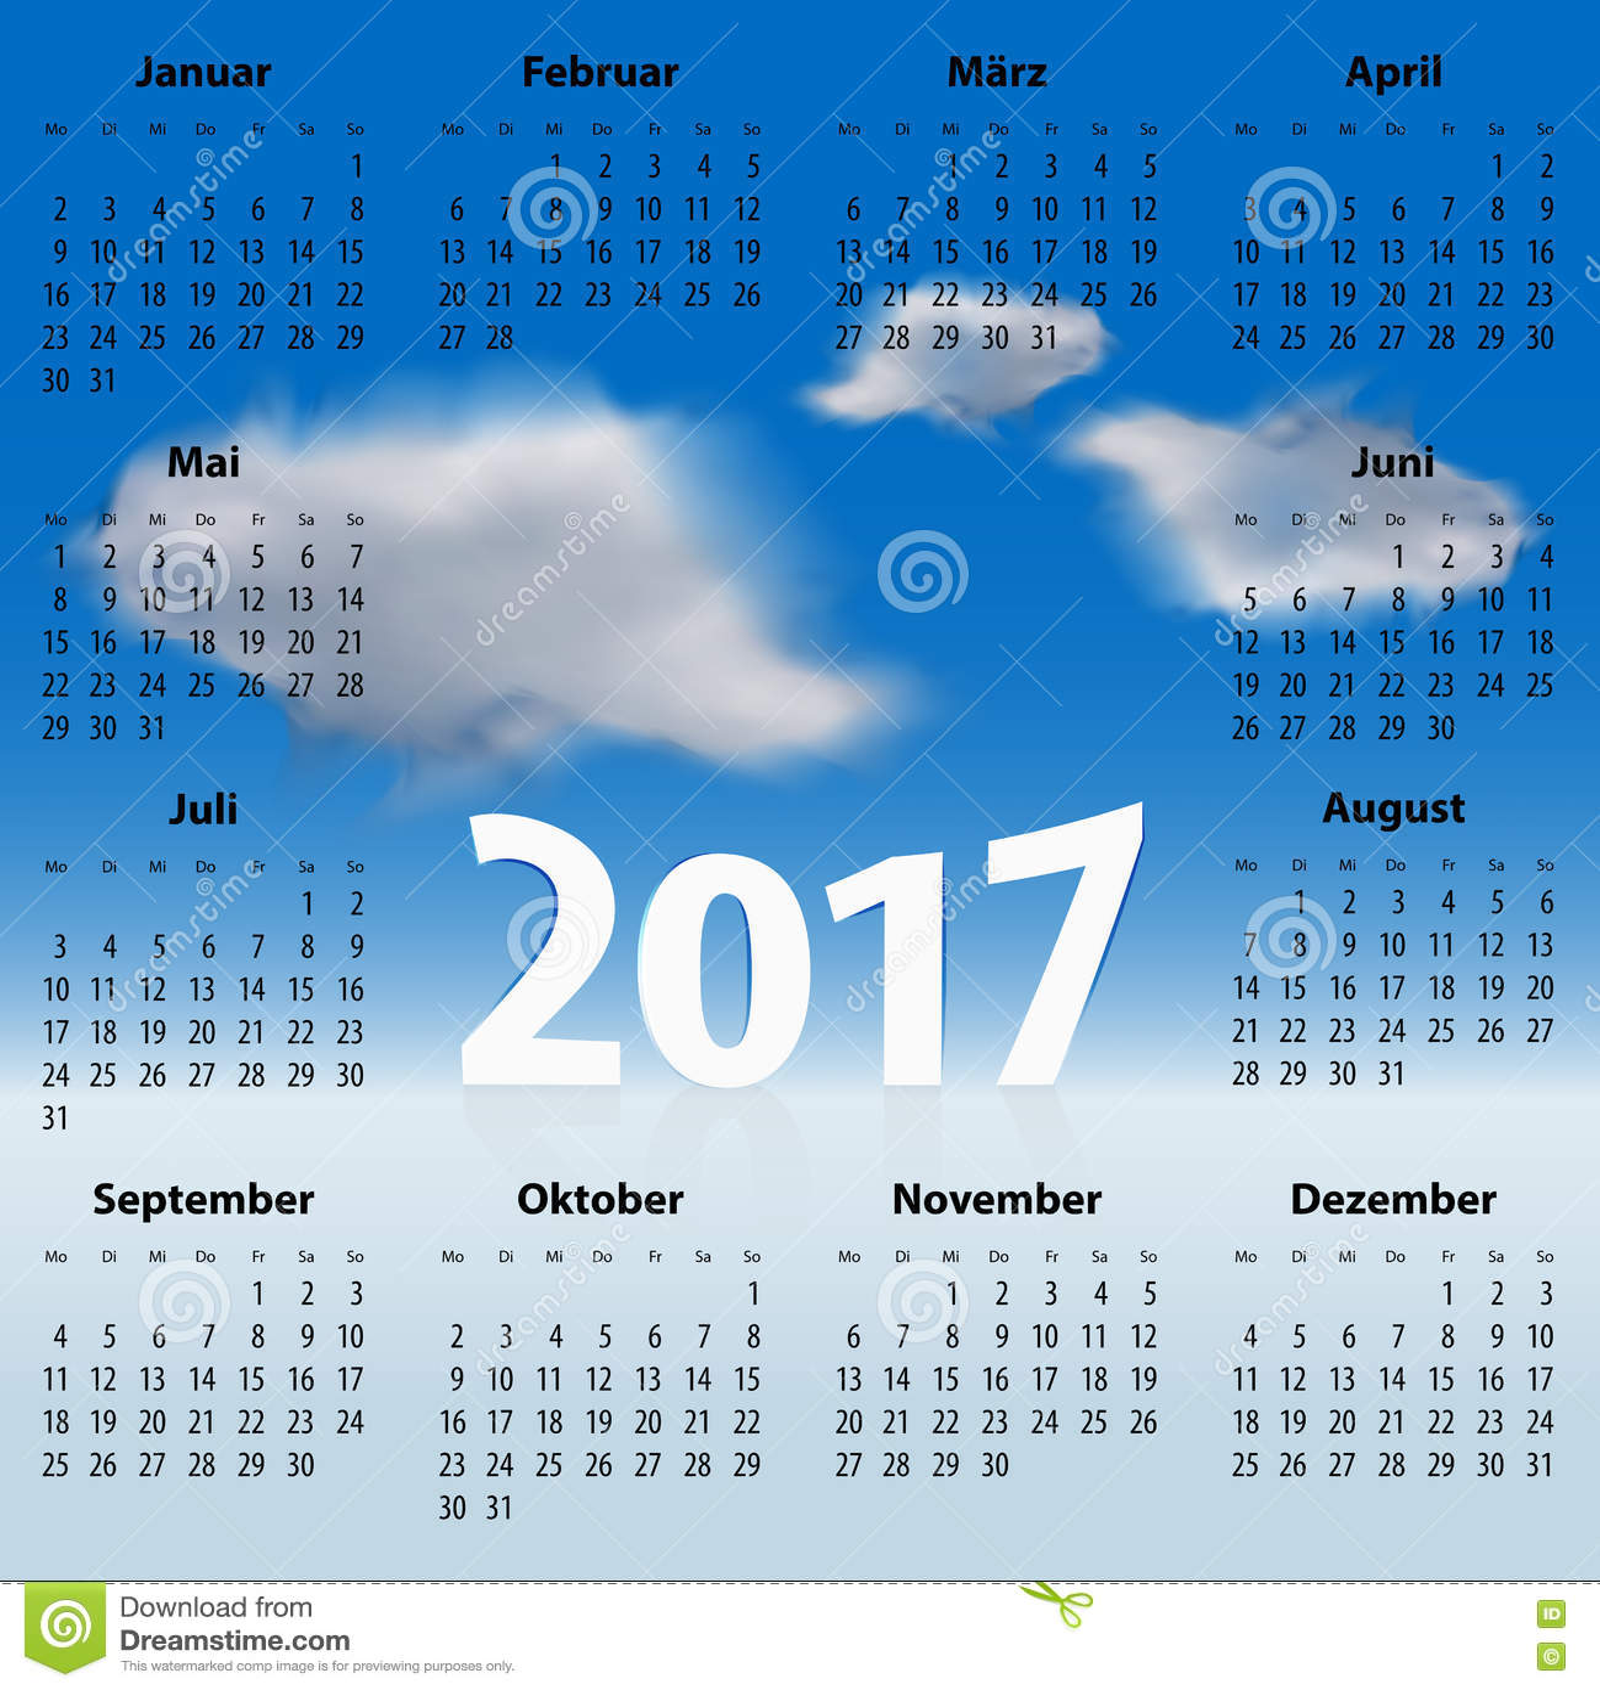 Календарь природы на немецком языке картинки